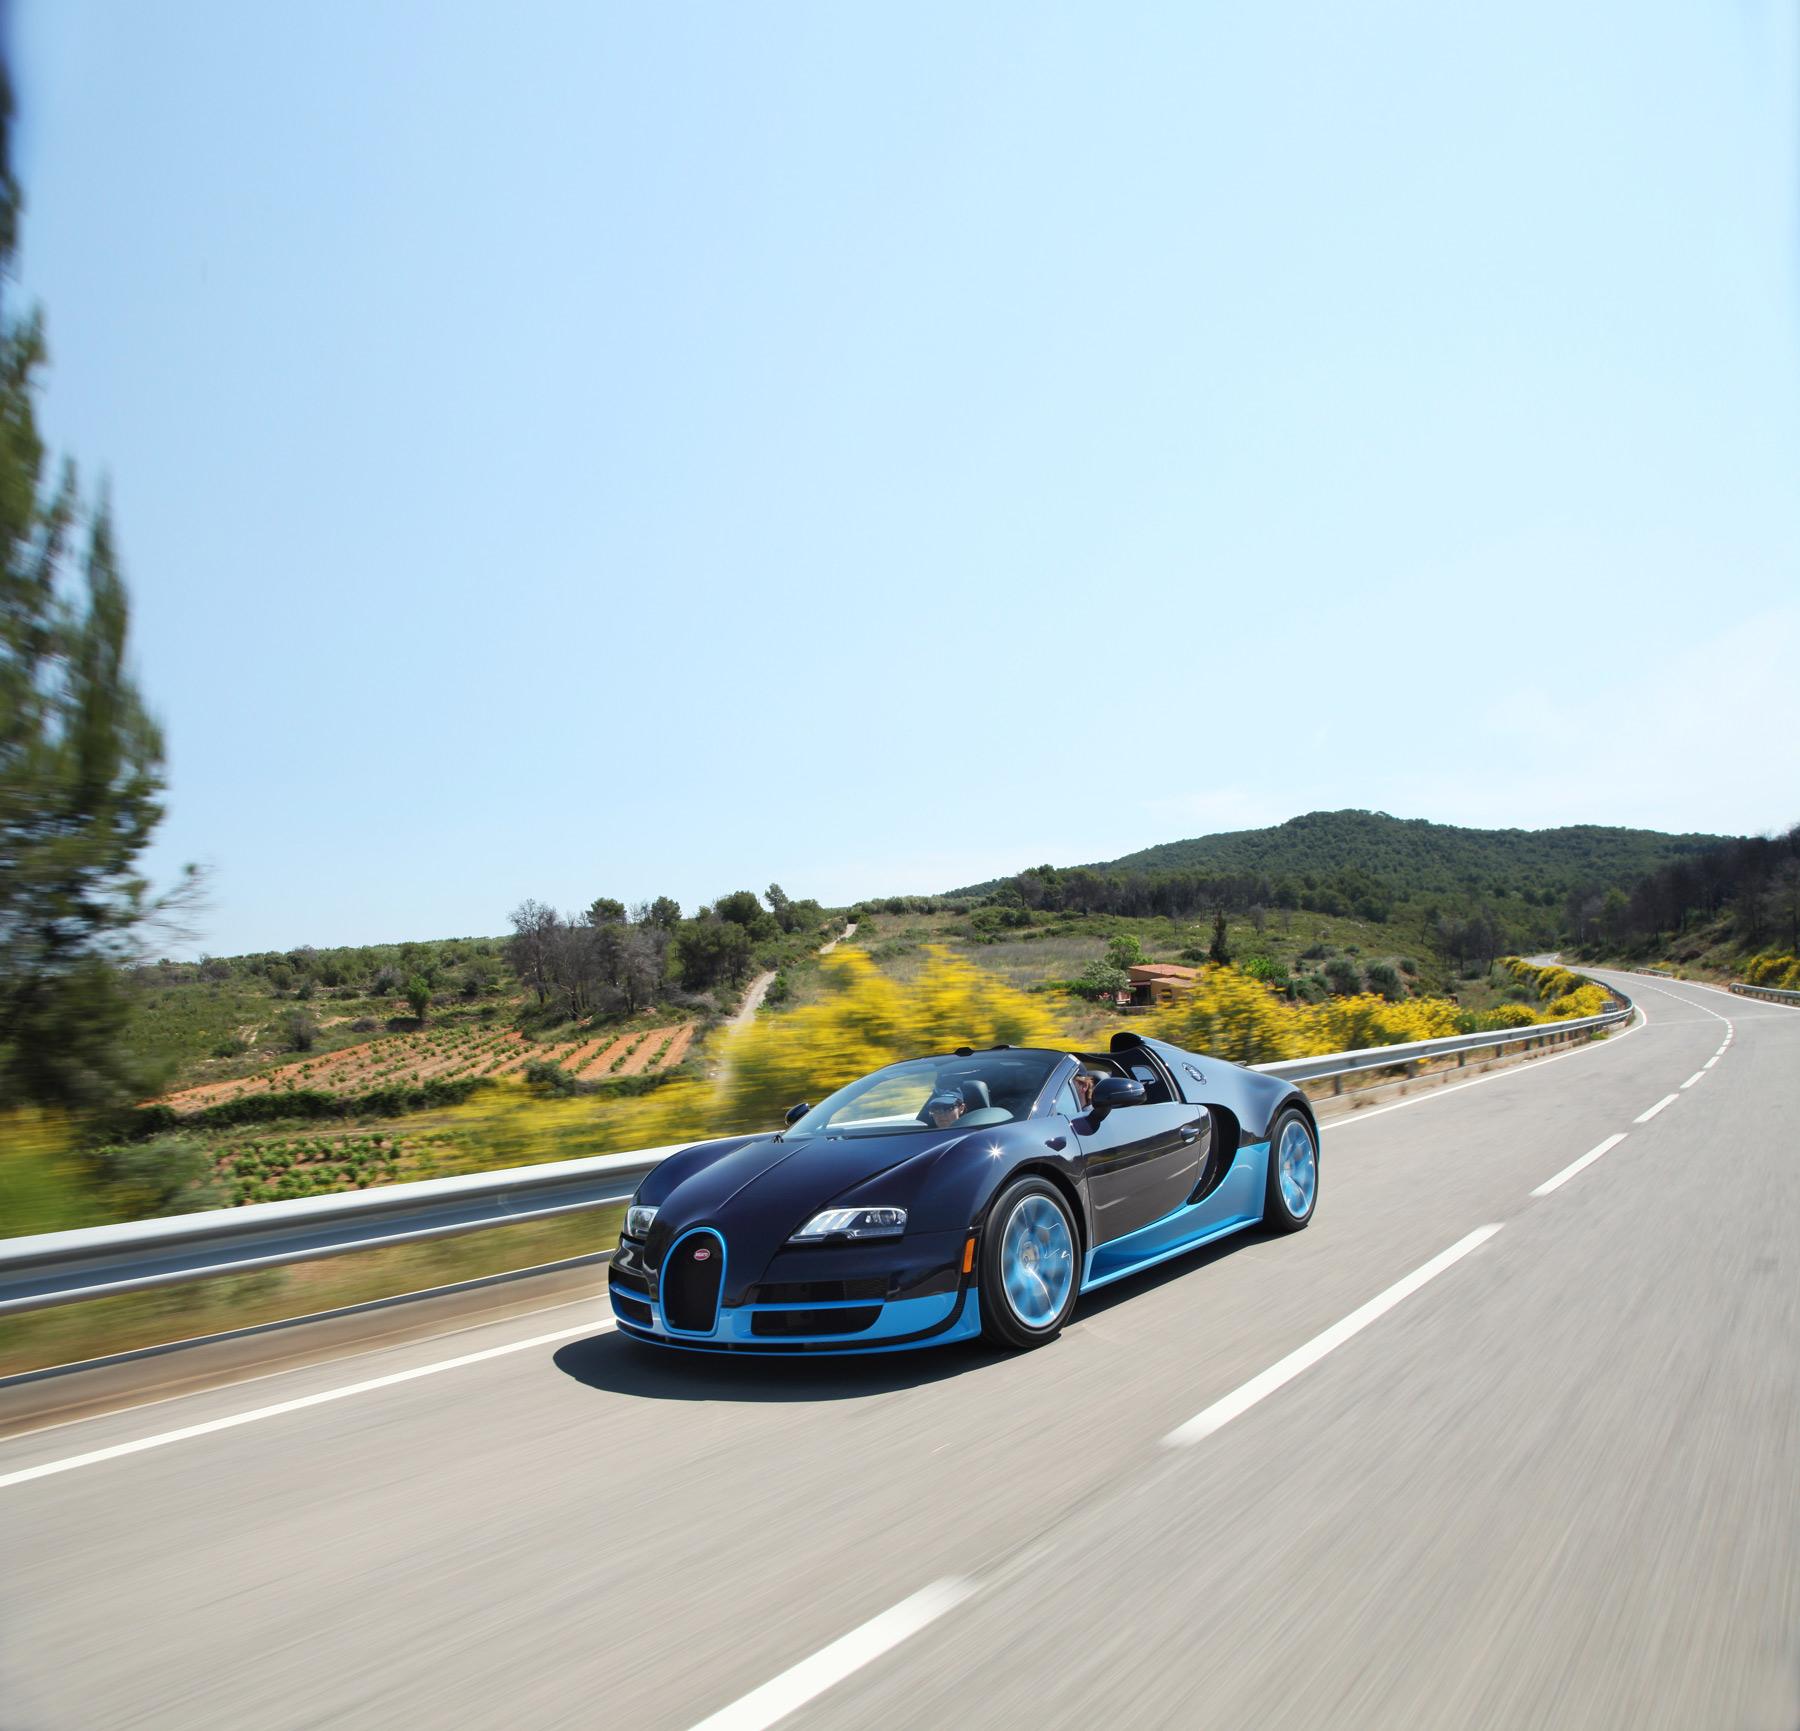 Bugatti Sport: Auto Review: Bugatti Veyron 16.4 Grand Sport Vitesse